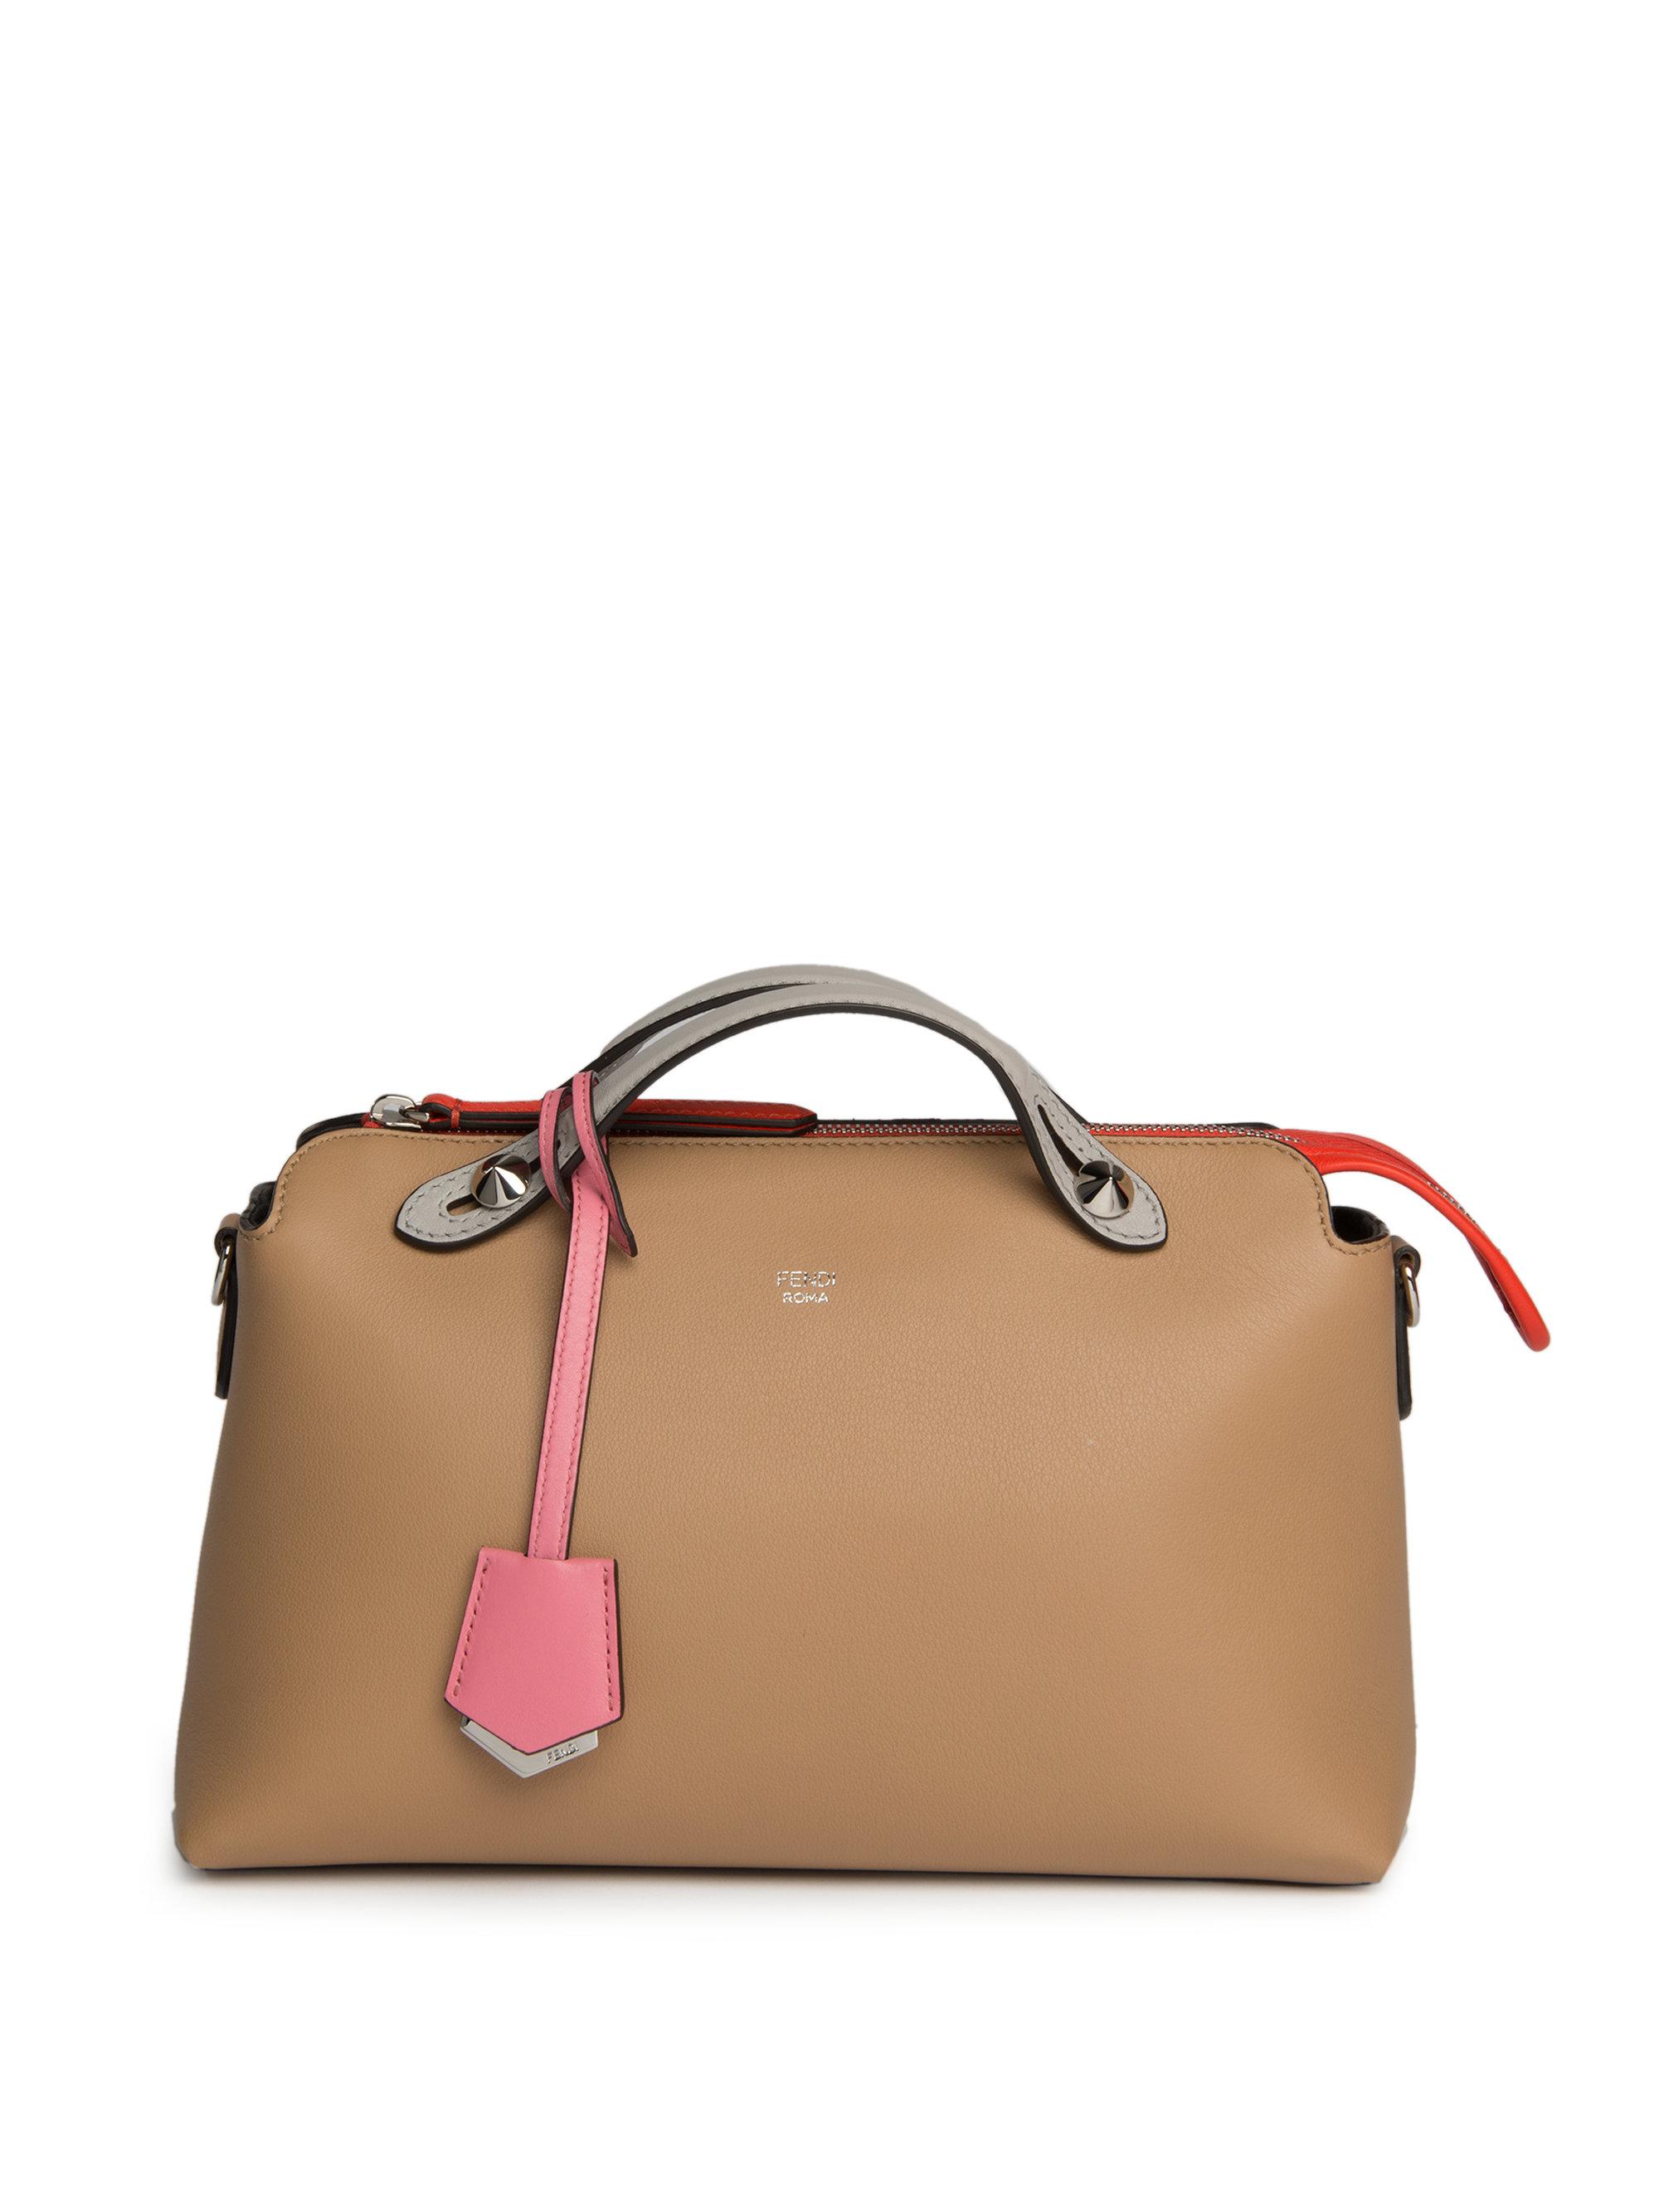 a21f41e0d5c fendi ruffled leather satchel, discount fendi outlet